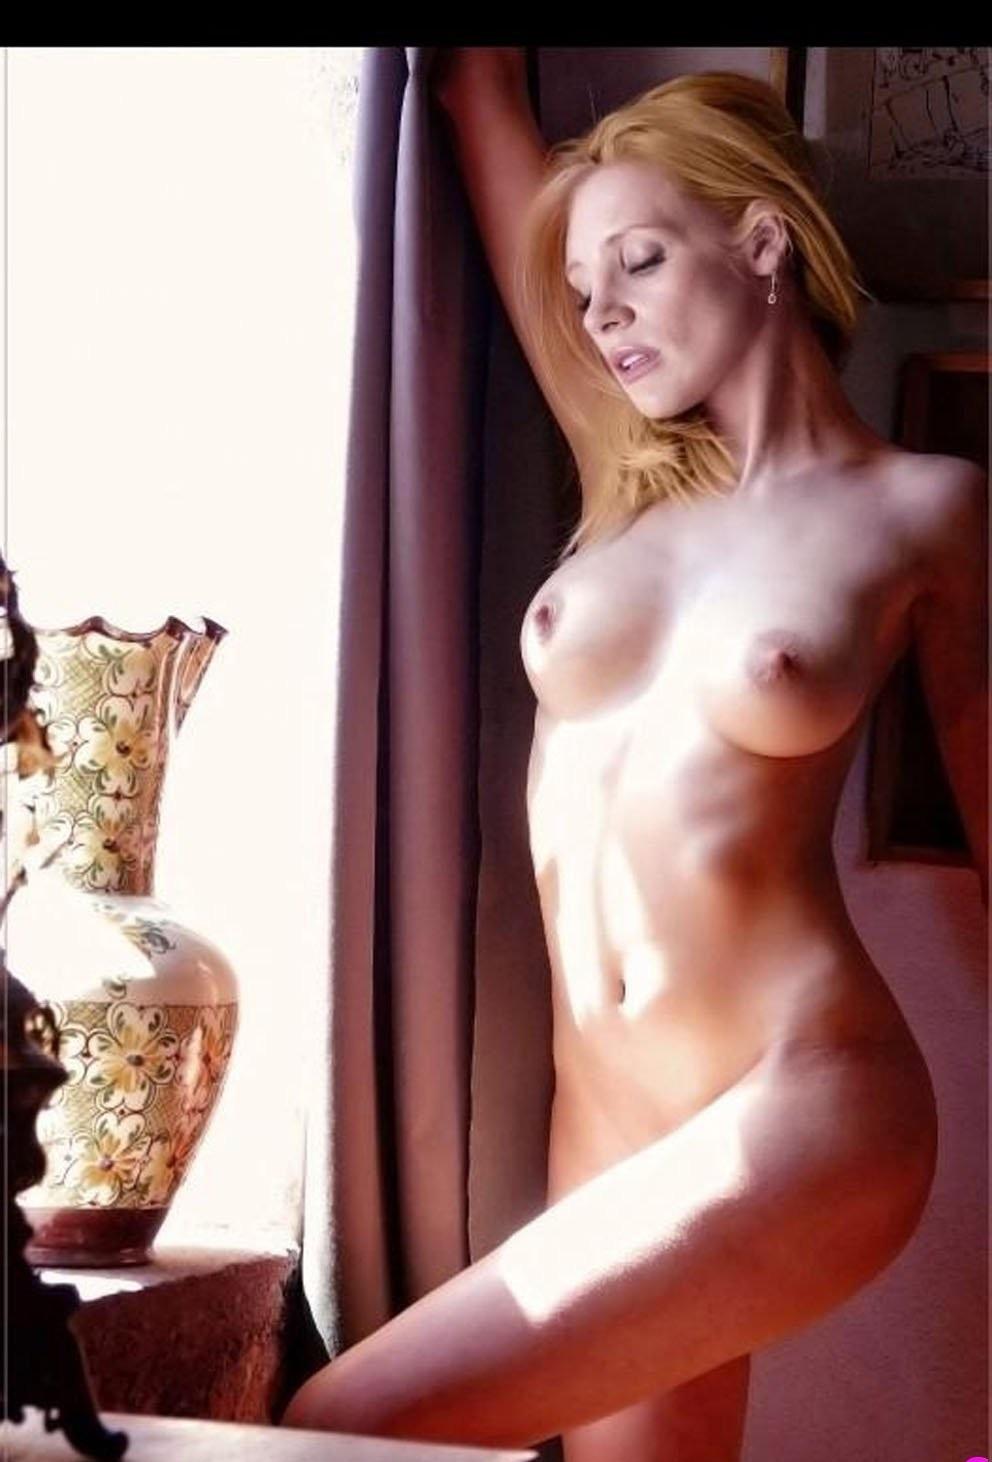 nude girls not porn